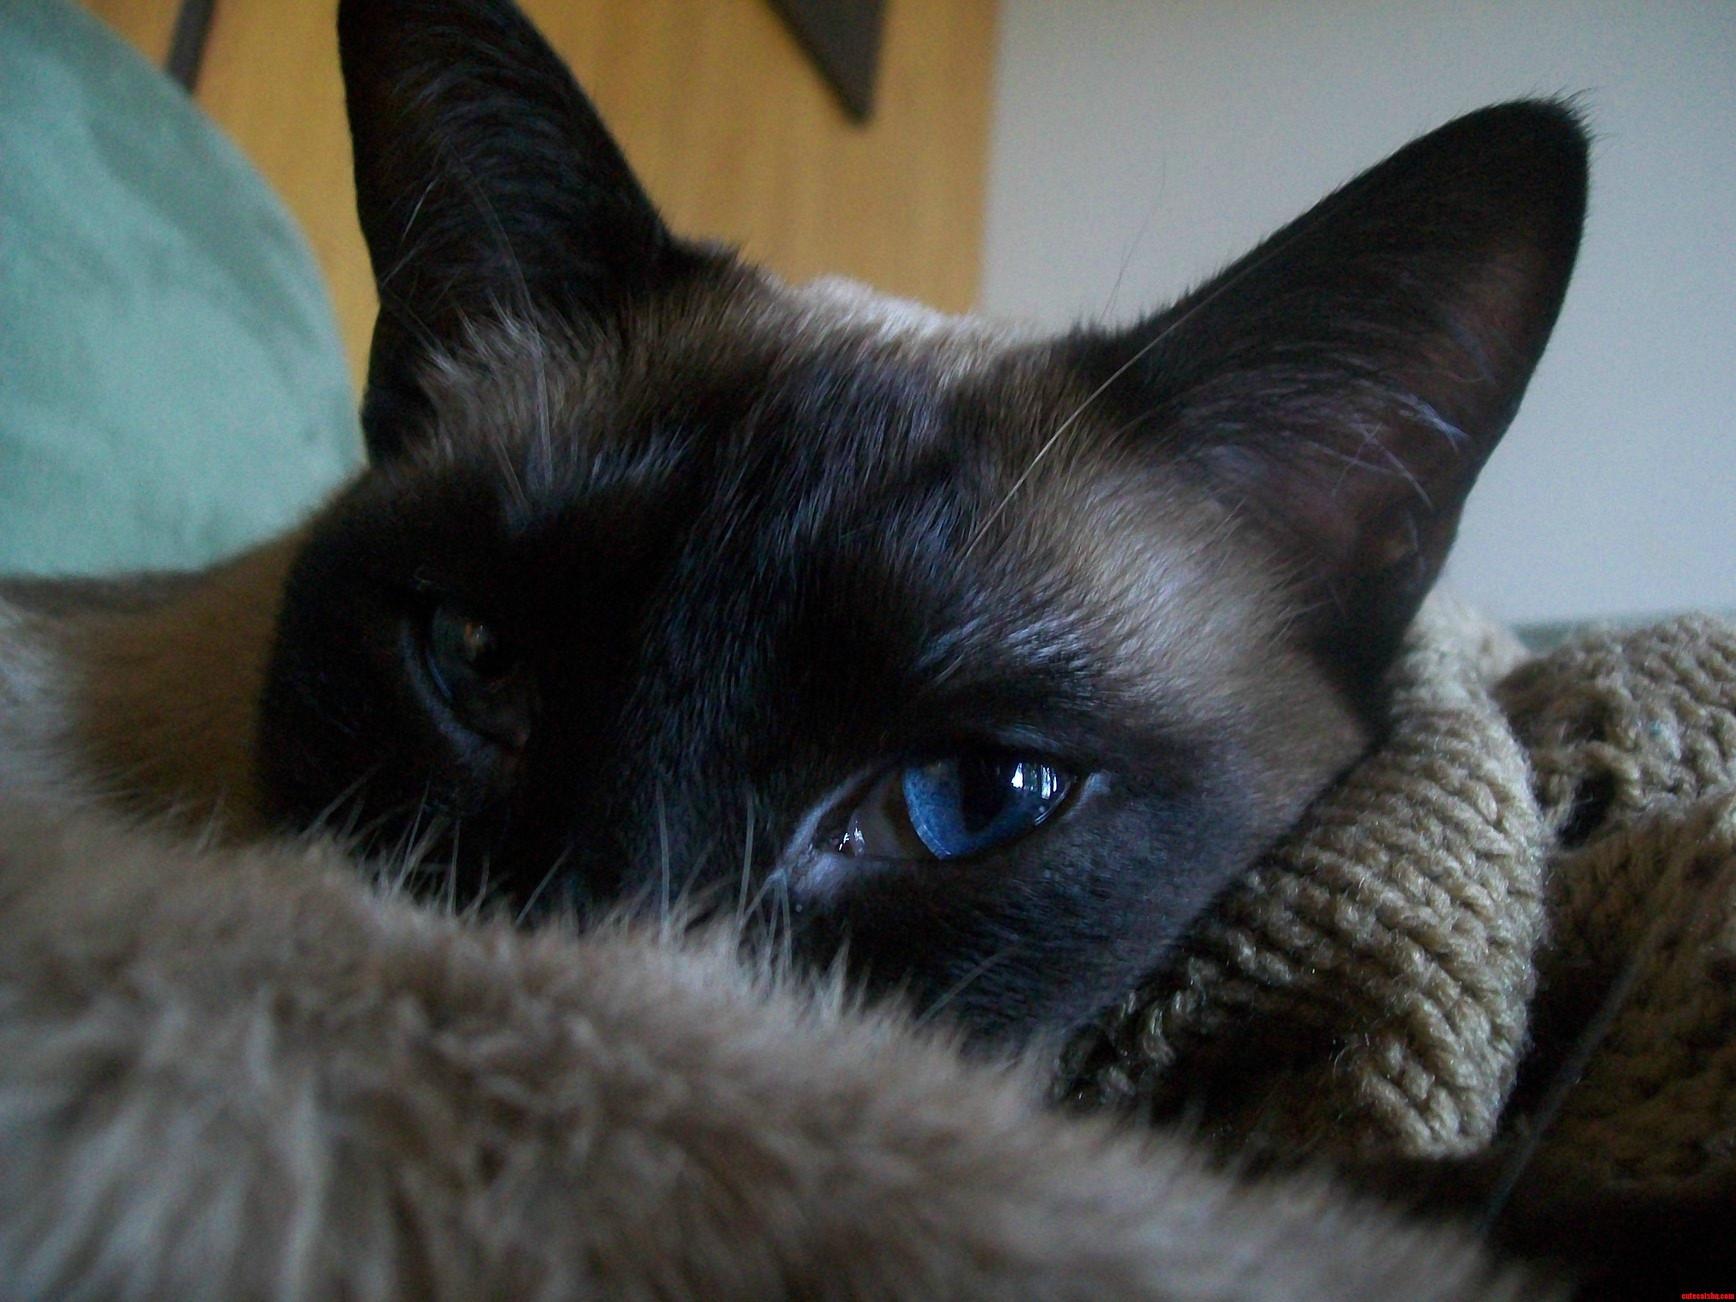 My Cat Magnus Has Crazy Blue Eyes